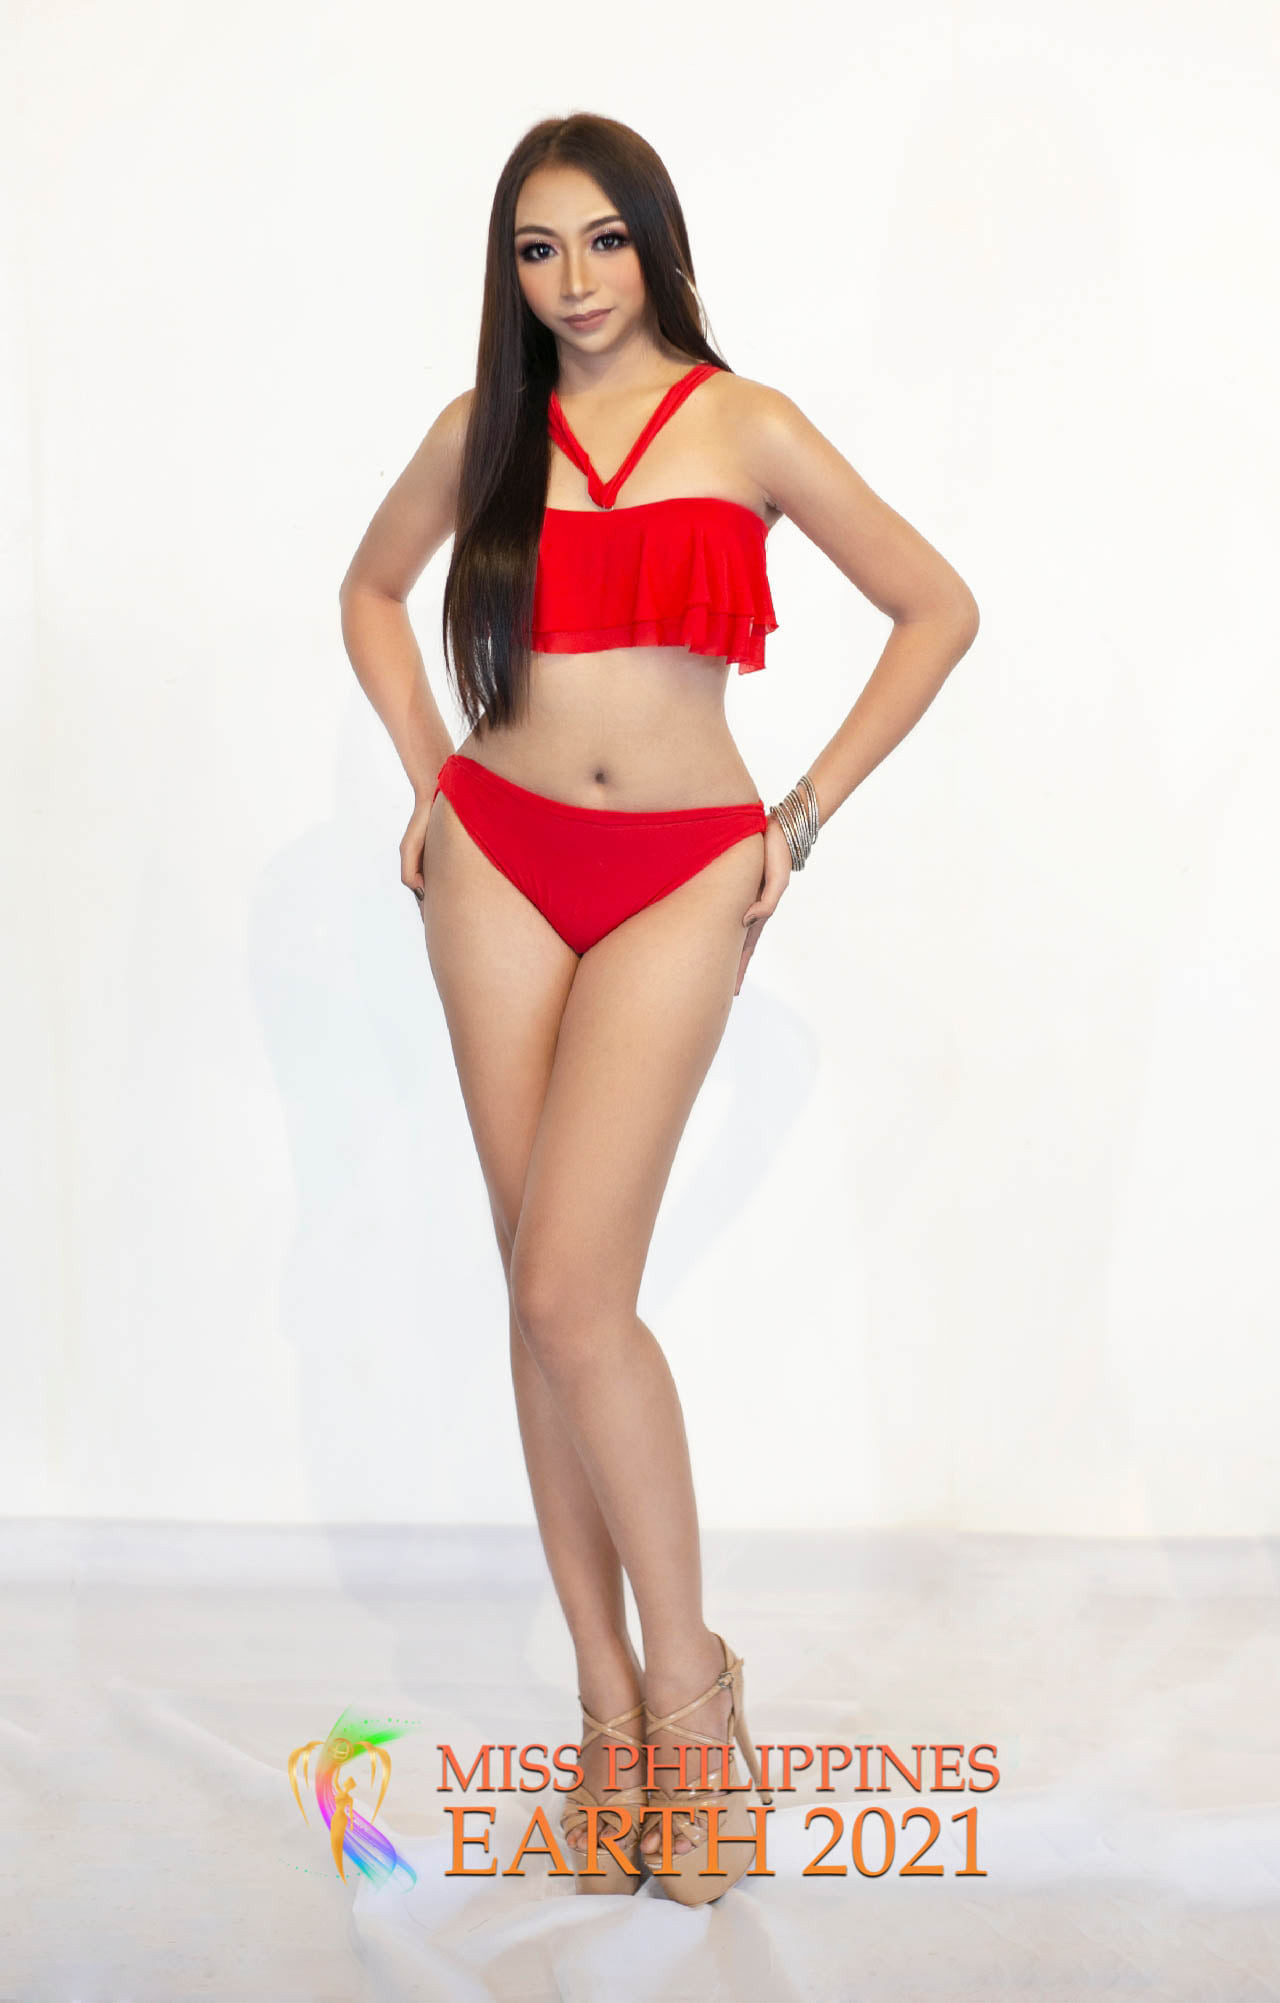 candidatas a miss earth philippines 2021. final: 8 agosto. - Página 6 OHyWV2